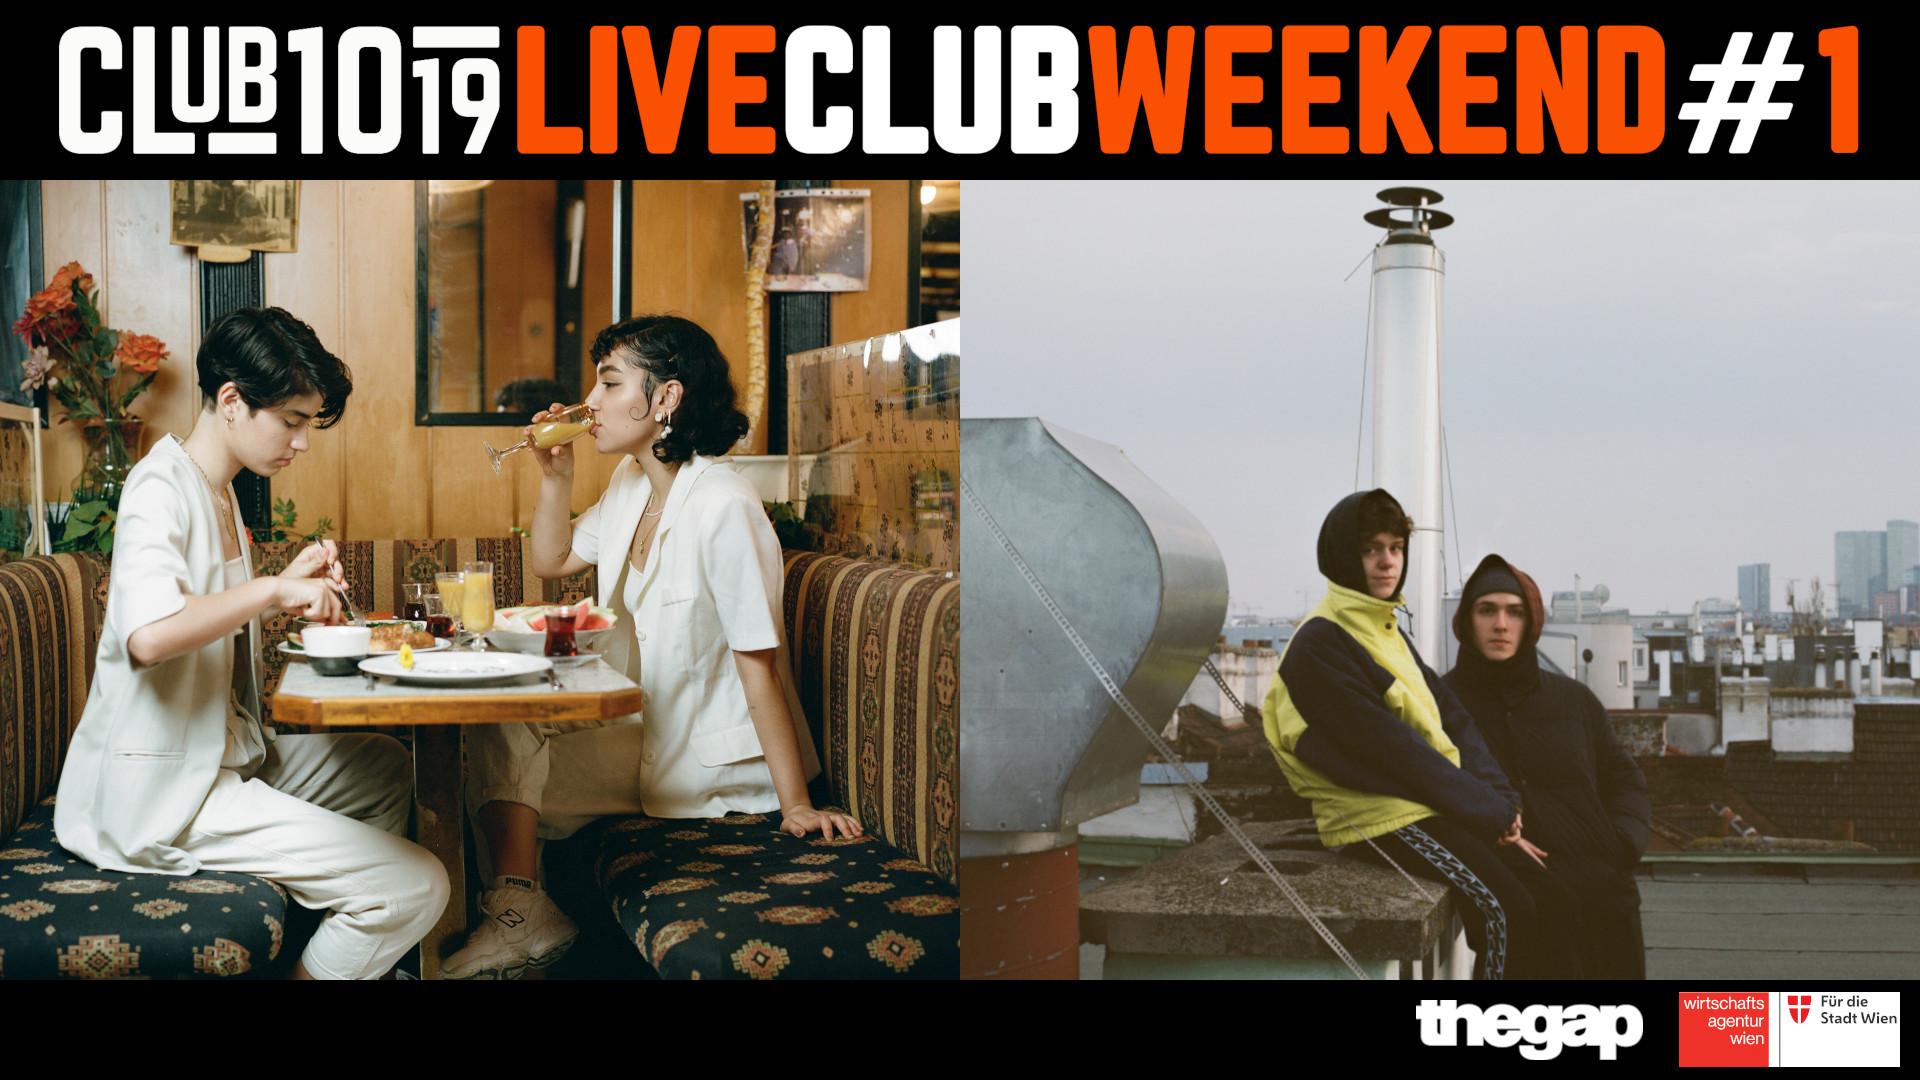 Aze • Skofi & Skyfarmer @ 1019 Live Club Weekend #1